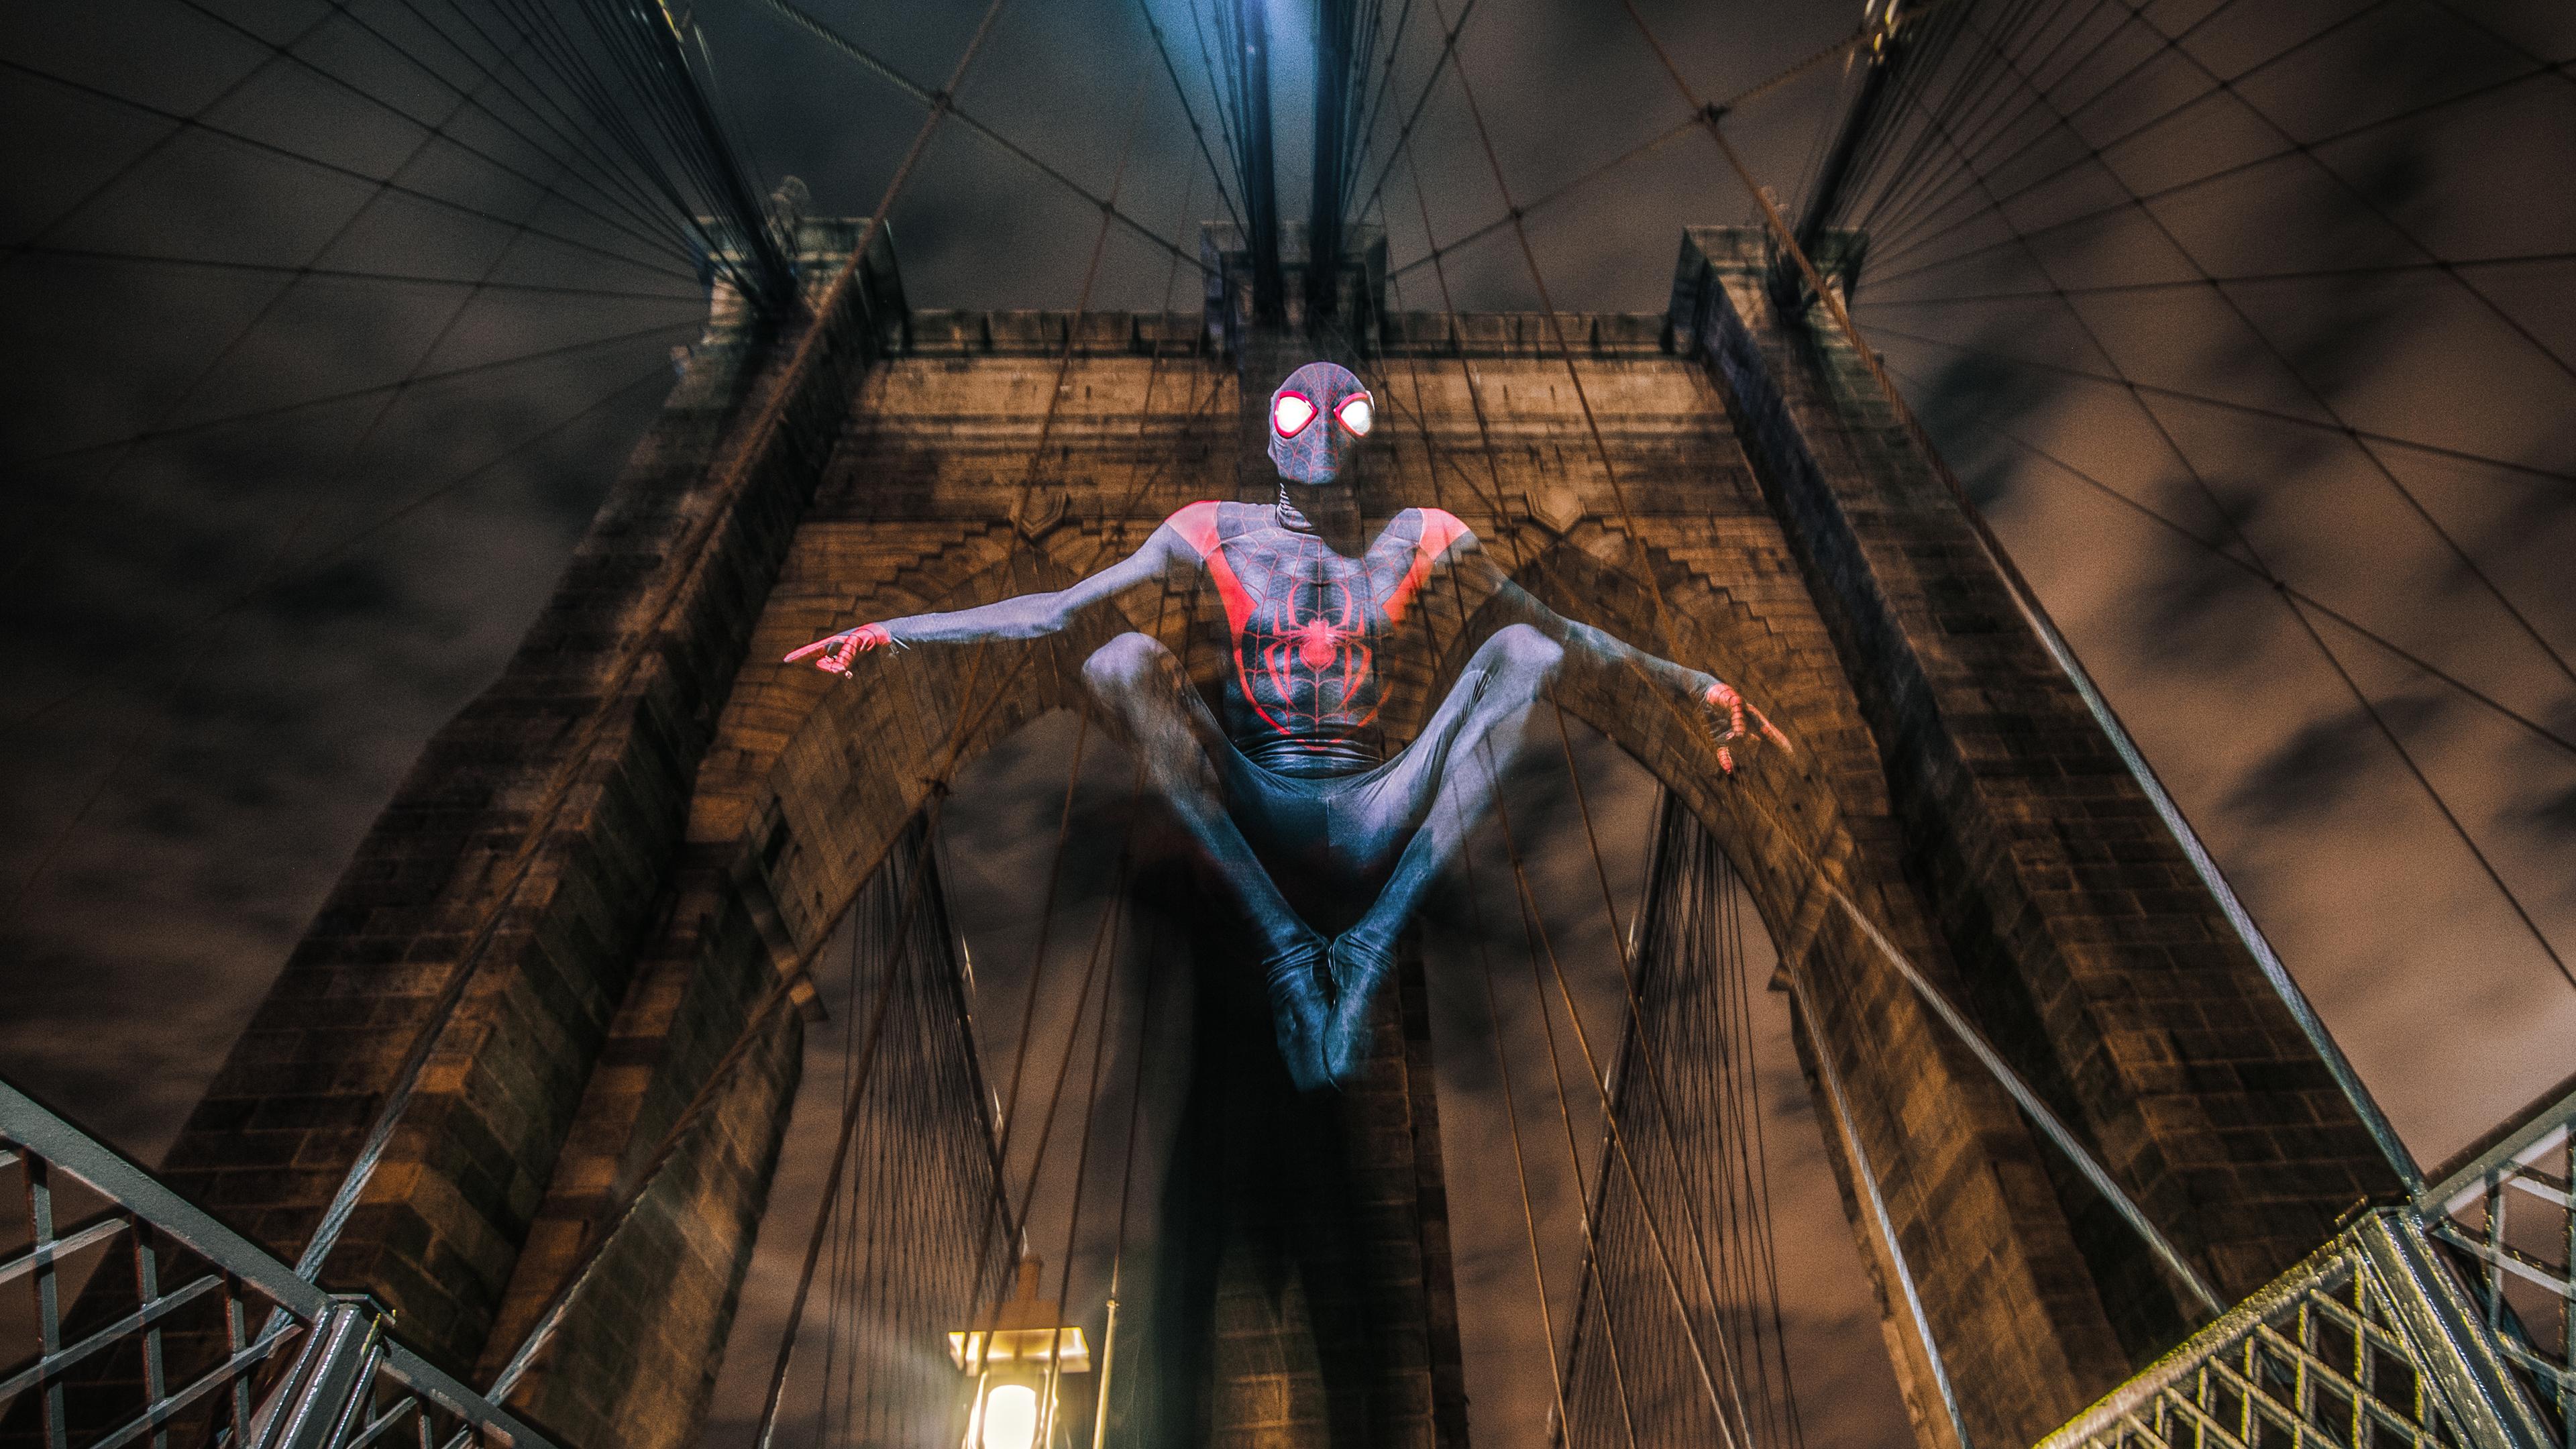 spider miles morales cosplay 4k 1544923022 - Spider Miles Morales Cosplay 4k - superheroes wallpapers, spiderman into the spider verse wallpapers, hd-wallpapers, digital art wallpapers, cosplay wallpapers, behance wallpapers, artwork wallpapers, artist wallpapers, 4k-wallpapers